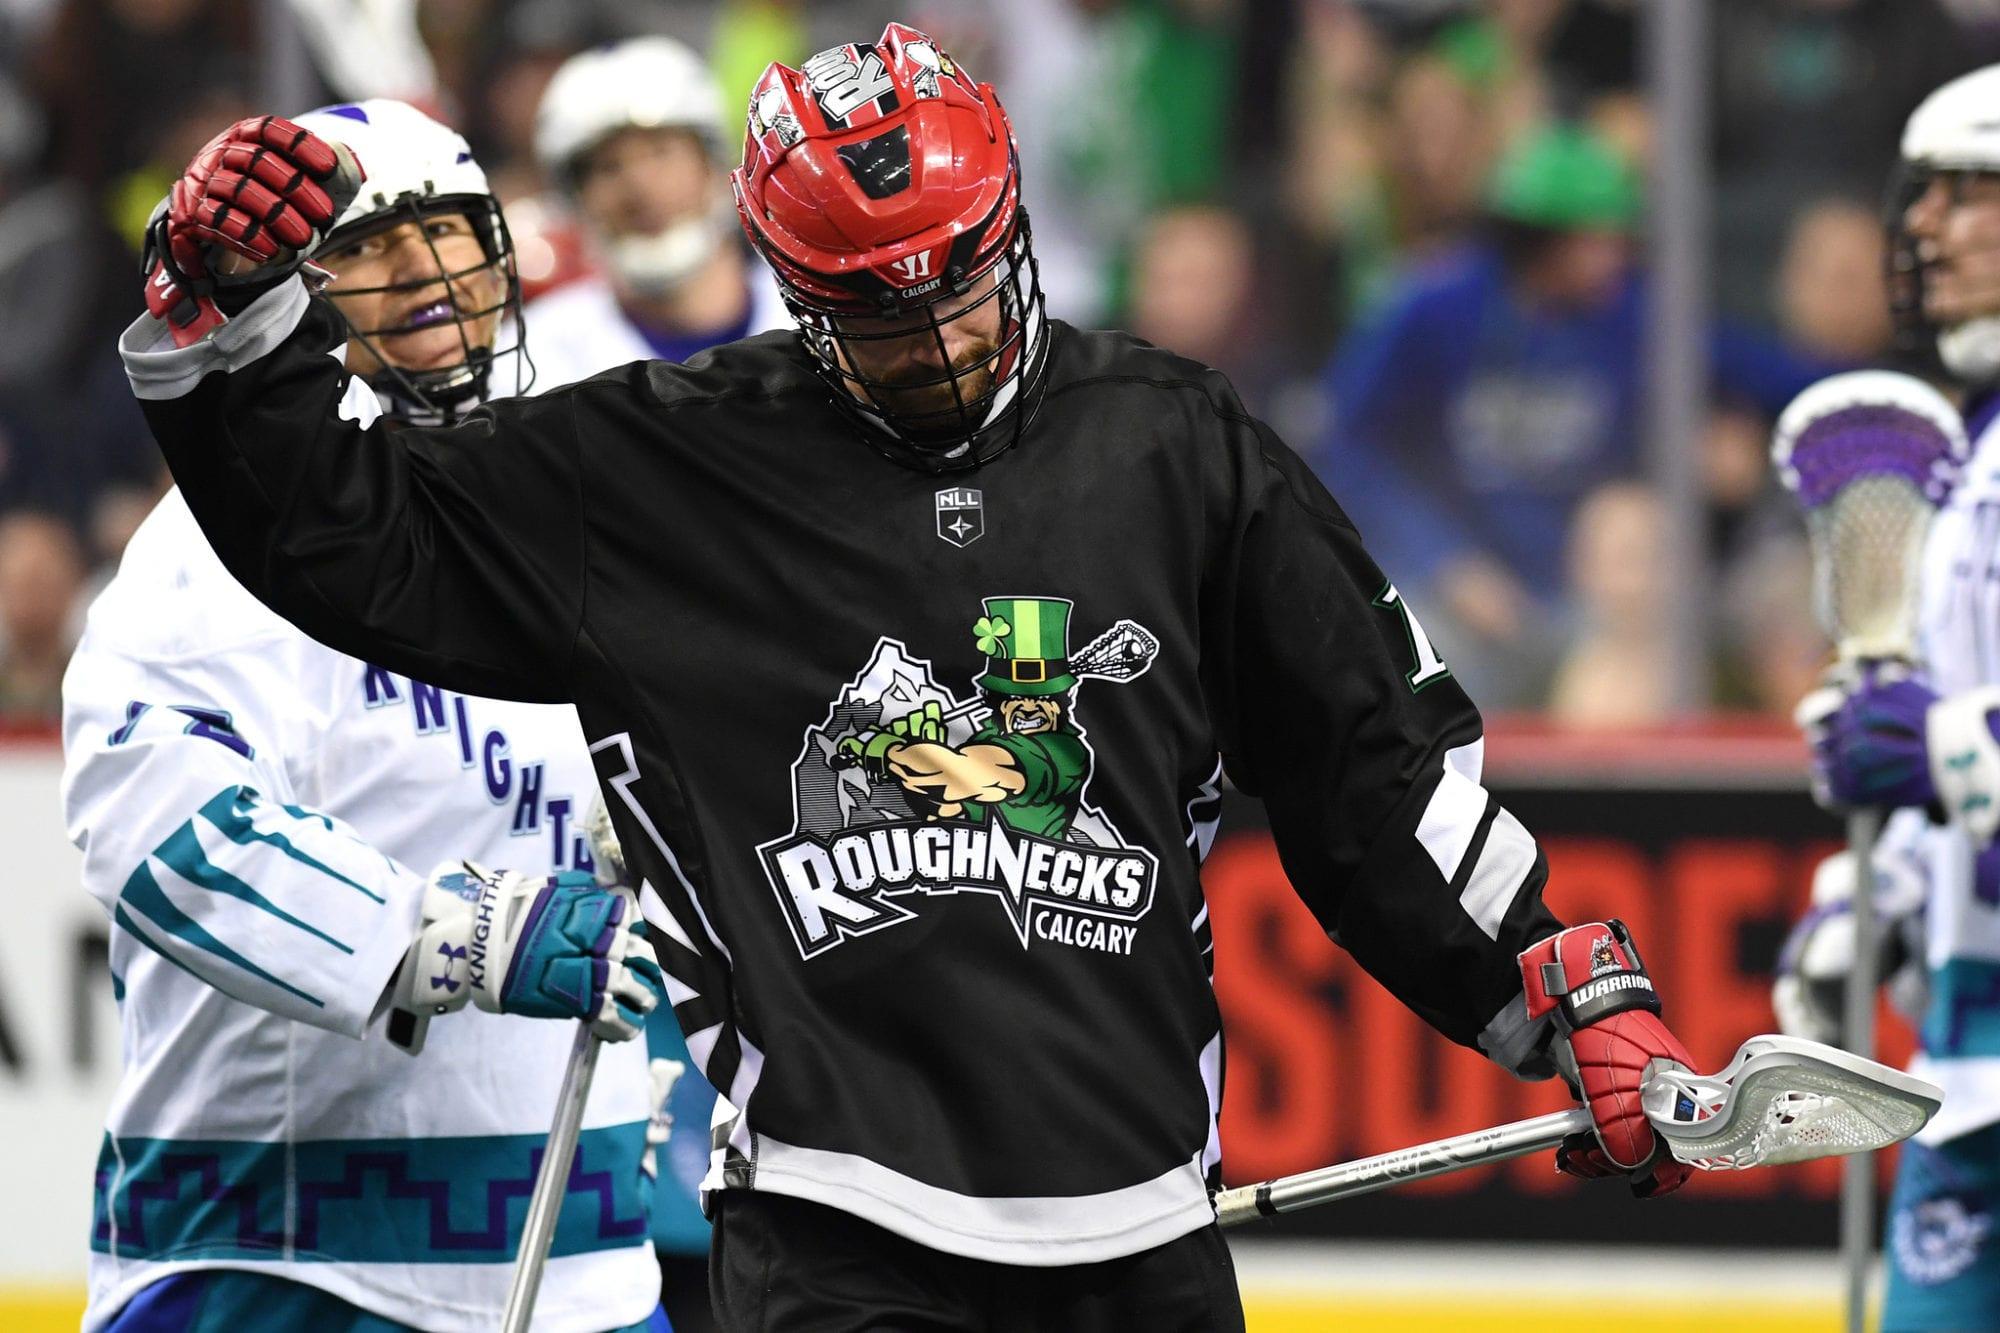 Curtis Dickson Calgary ROughnecks NLL 2018 lacrosse gifs